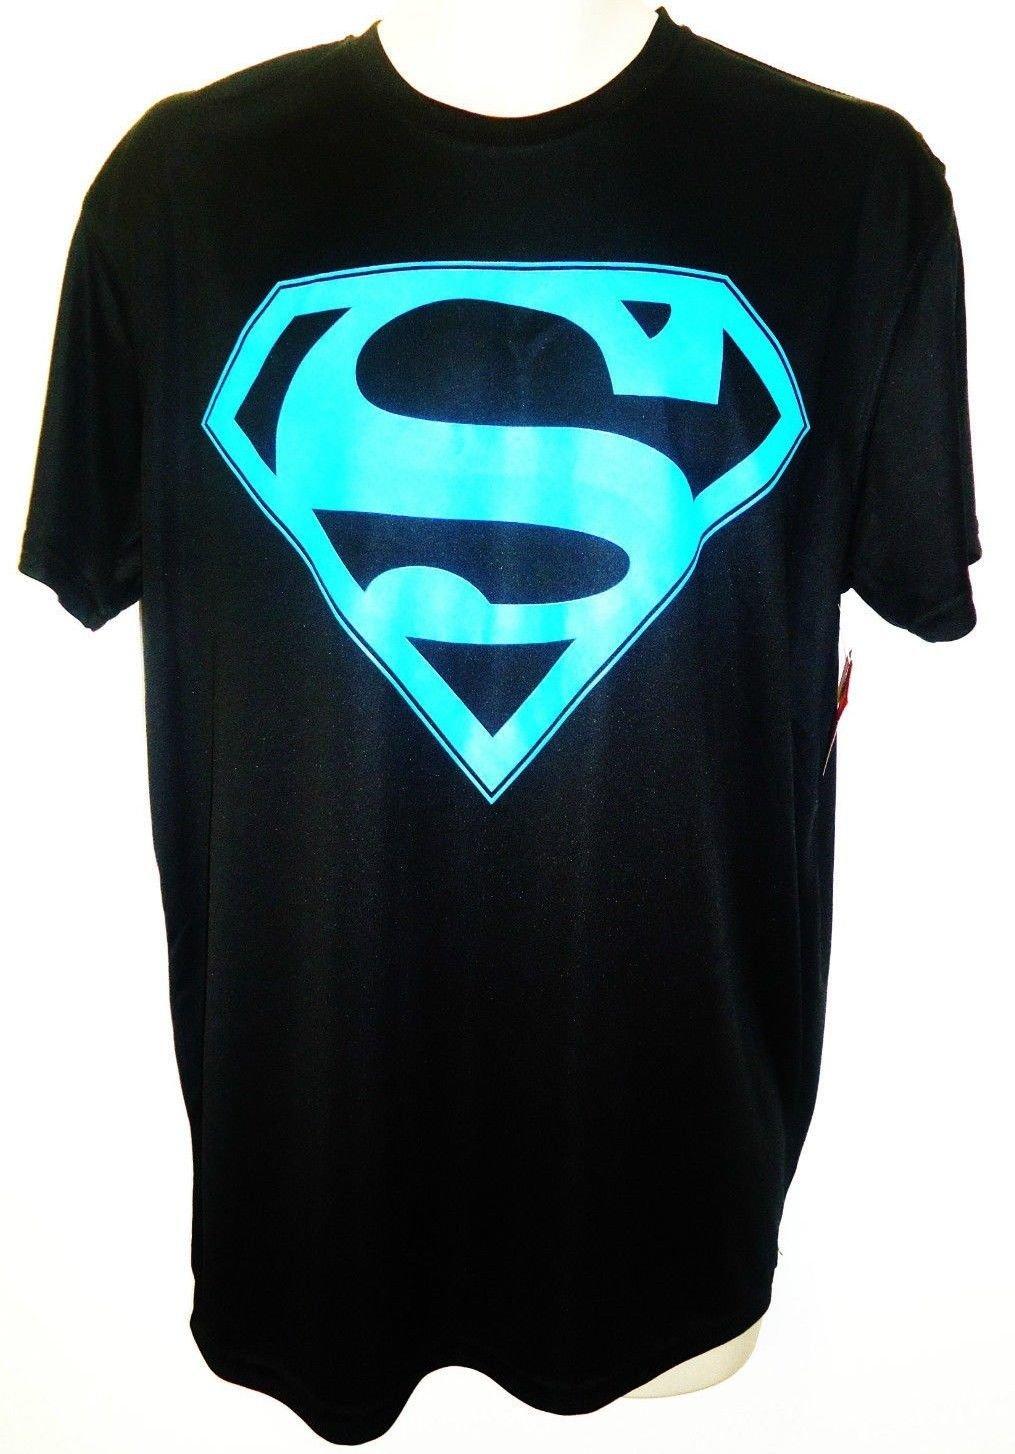 DC COMICS - SUPERMAN - BLACK - BLUE - MUSCLE - TEE - LARGE - BRAND NEW - BATMAN